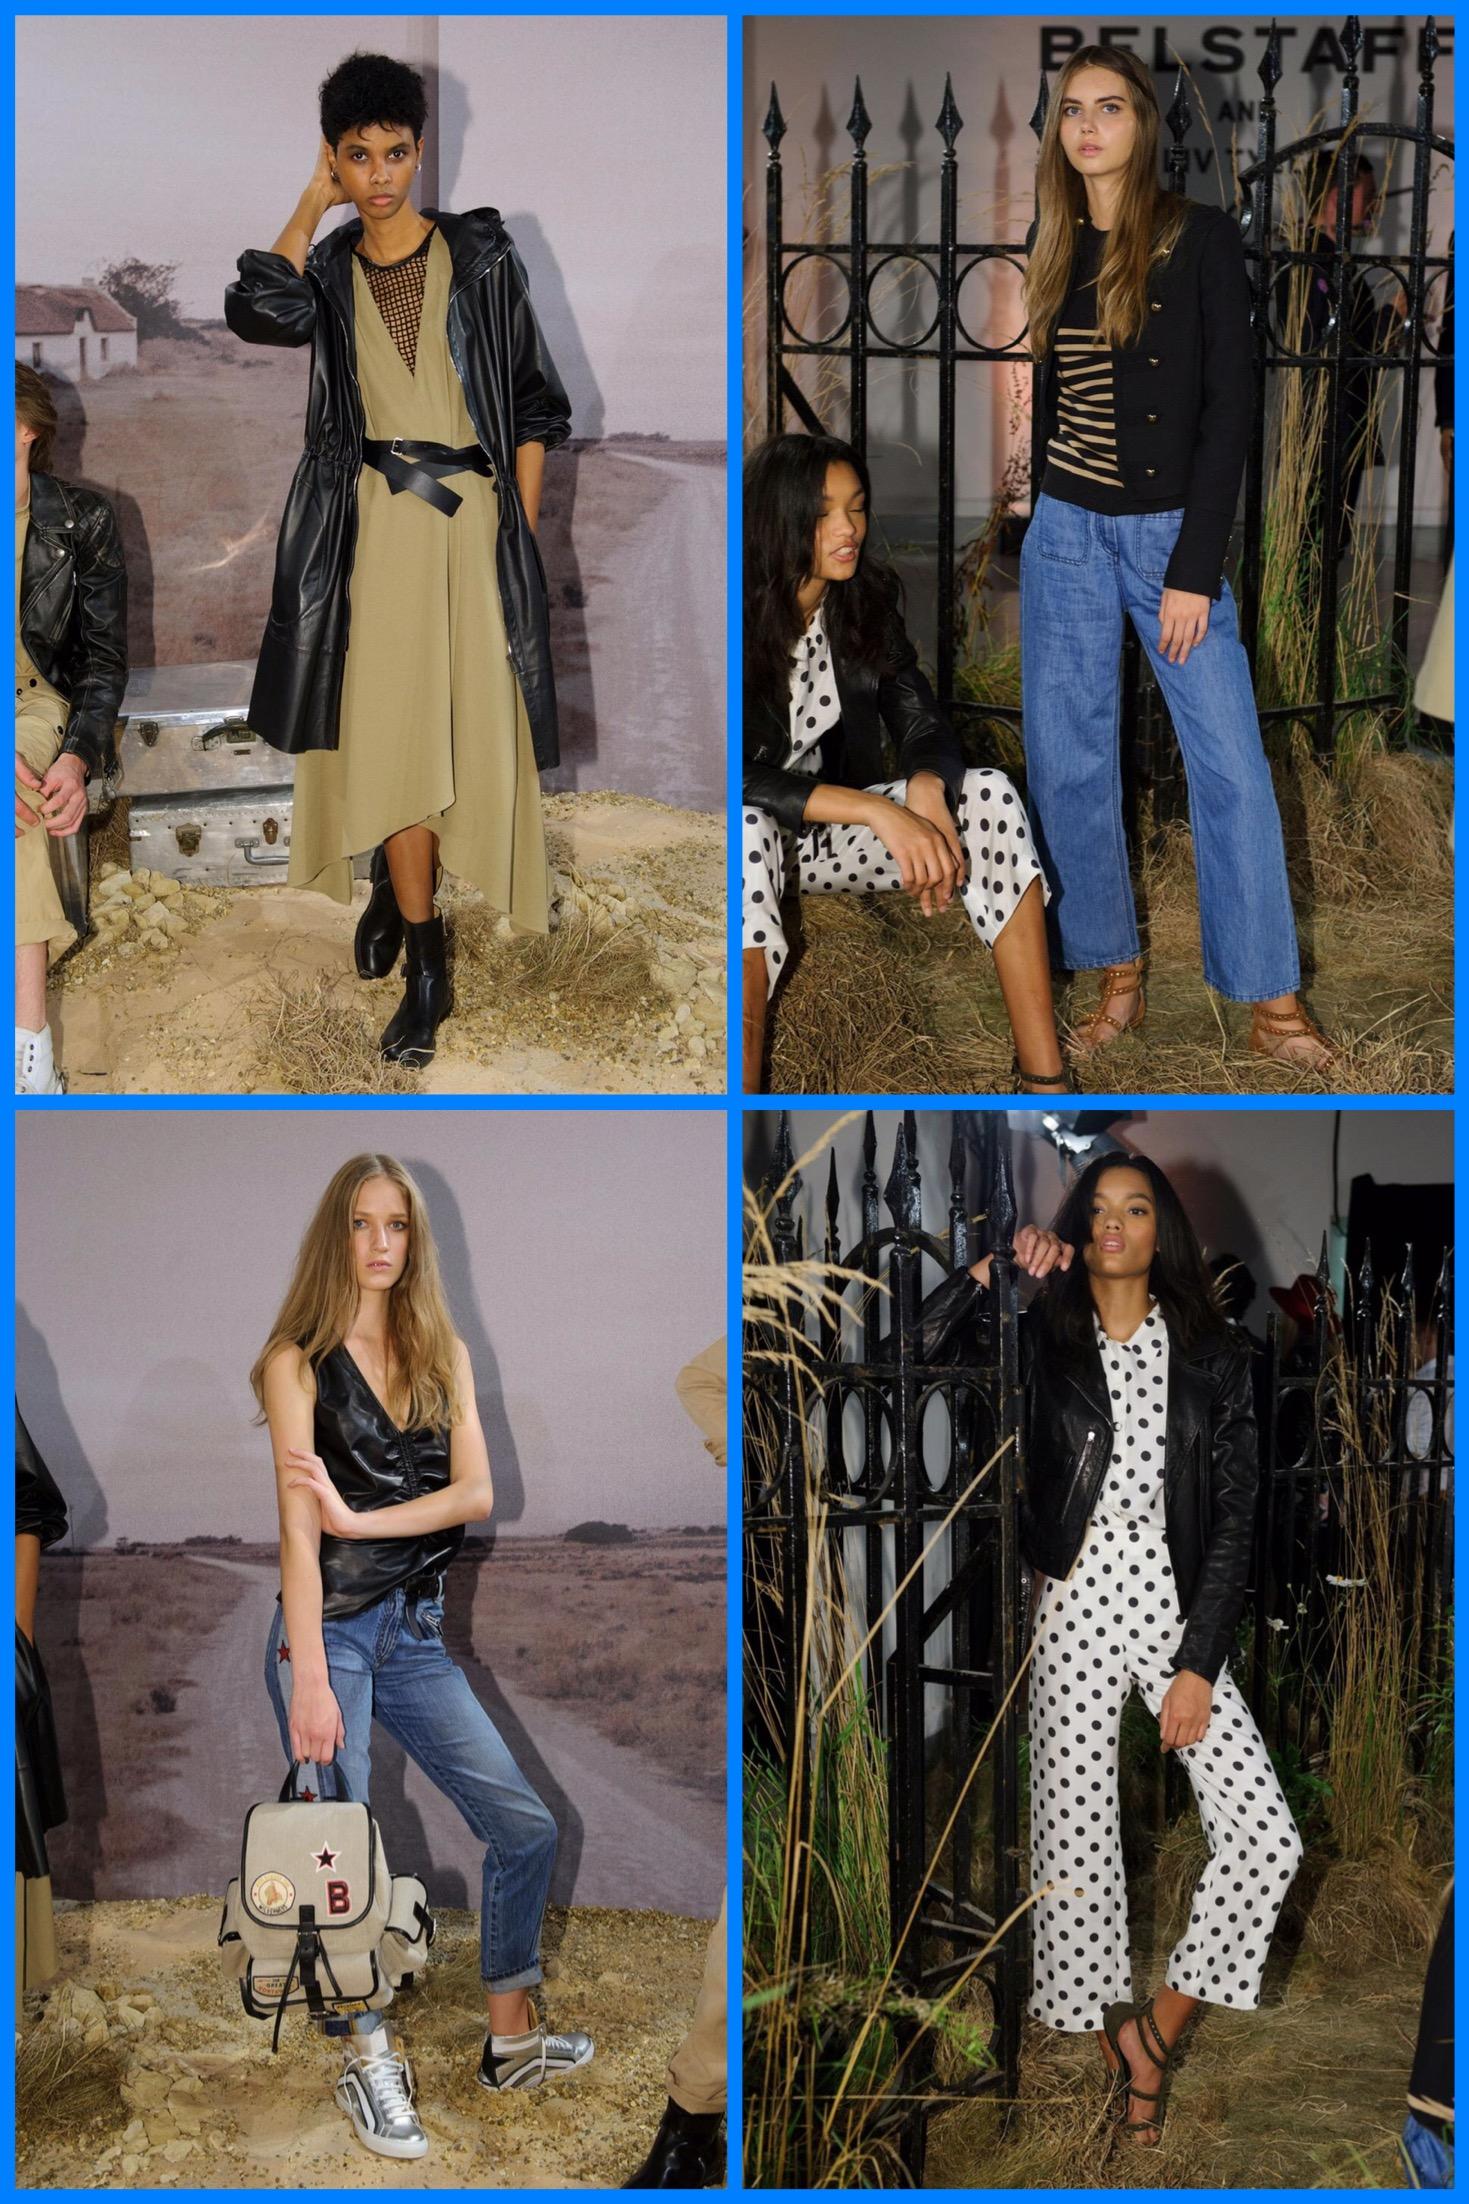 london-fashion-week-pret-a-porter-spring-summer-2017-style-belstaff